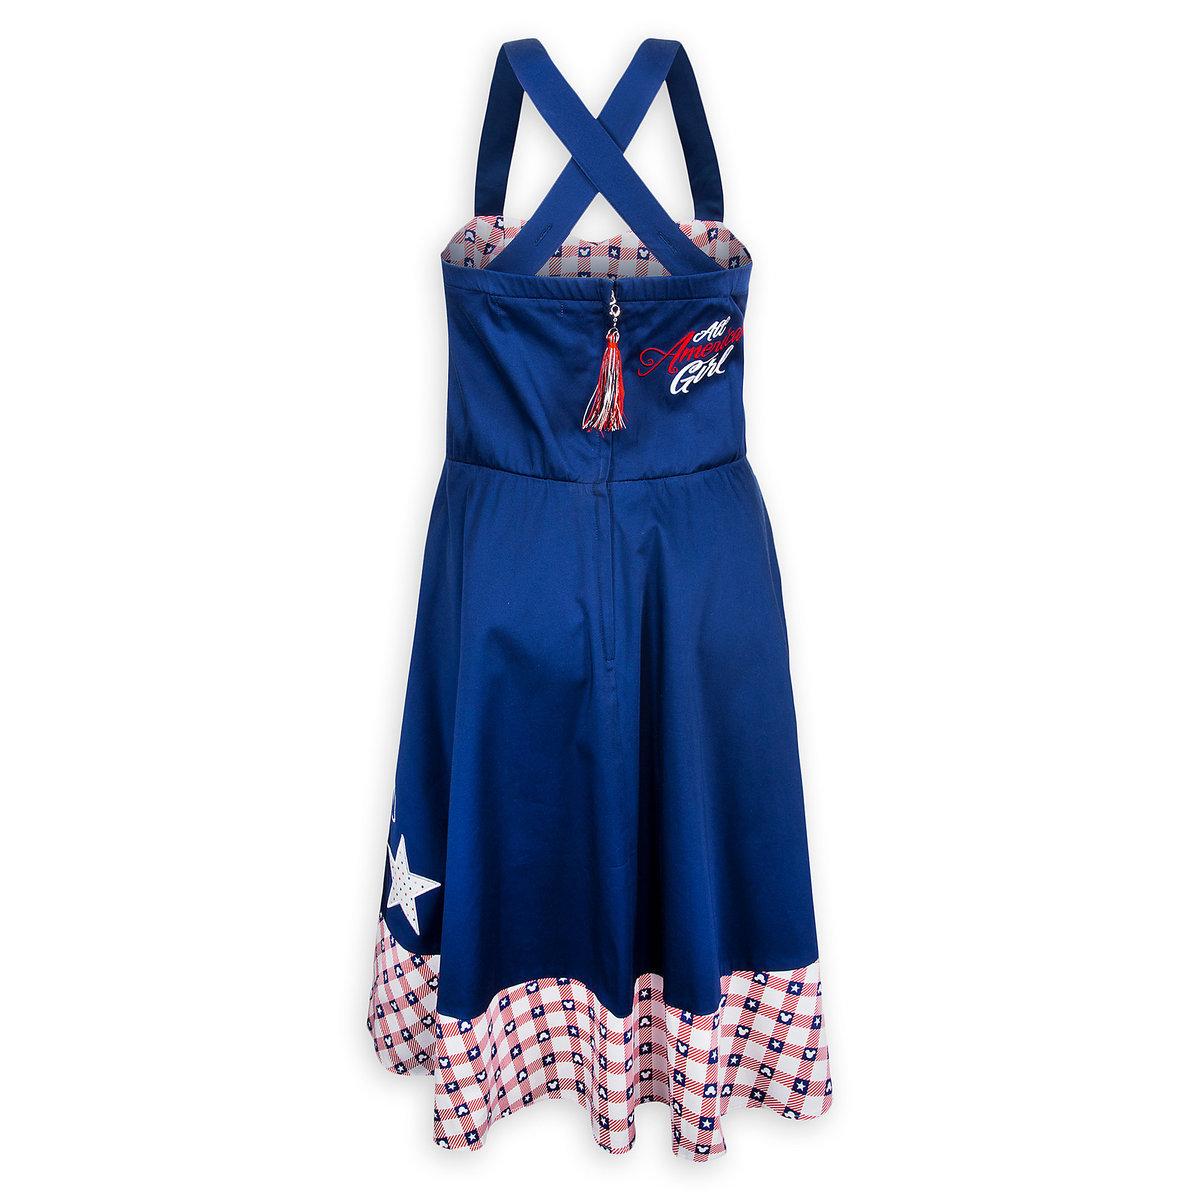 2fdb72dbb Disney Women's Dress - Mickey Mouse Americana